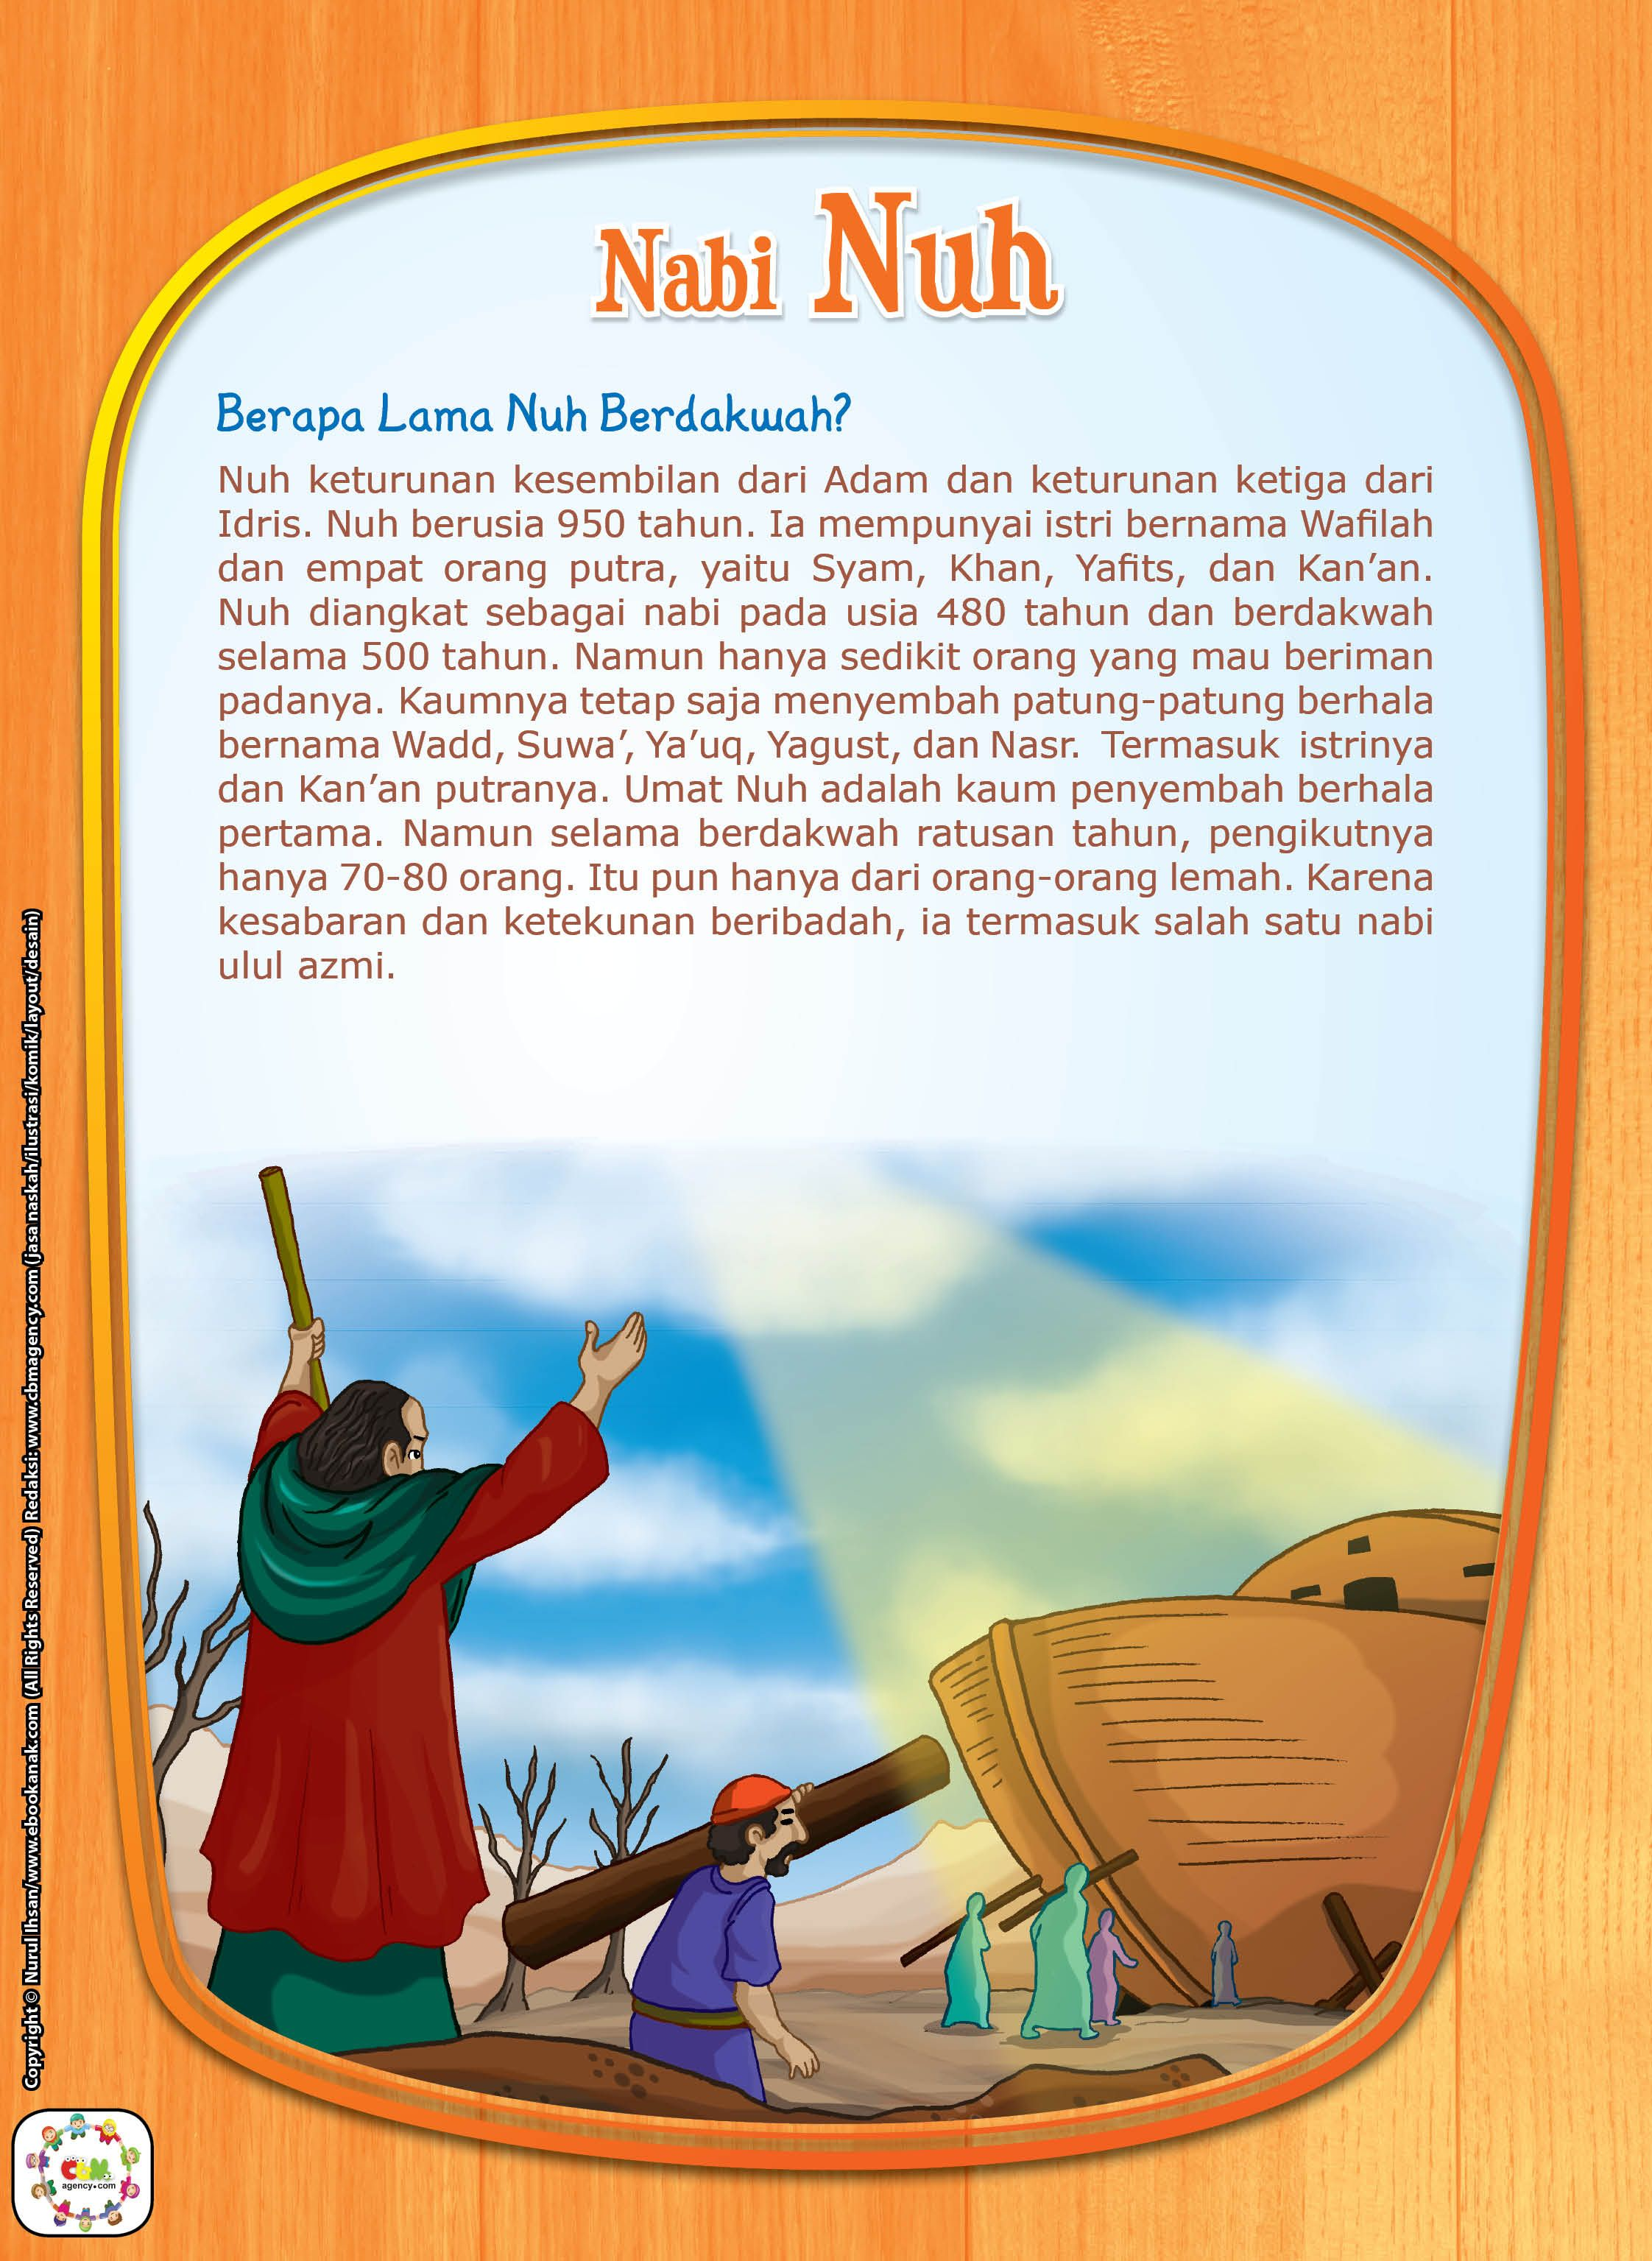 Kisah Nabi Nuh Lengkap : kisah, lengkap, Nabi2, Ideas, Story, Books,, Stories, Kids,, Islam